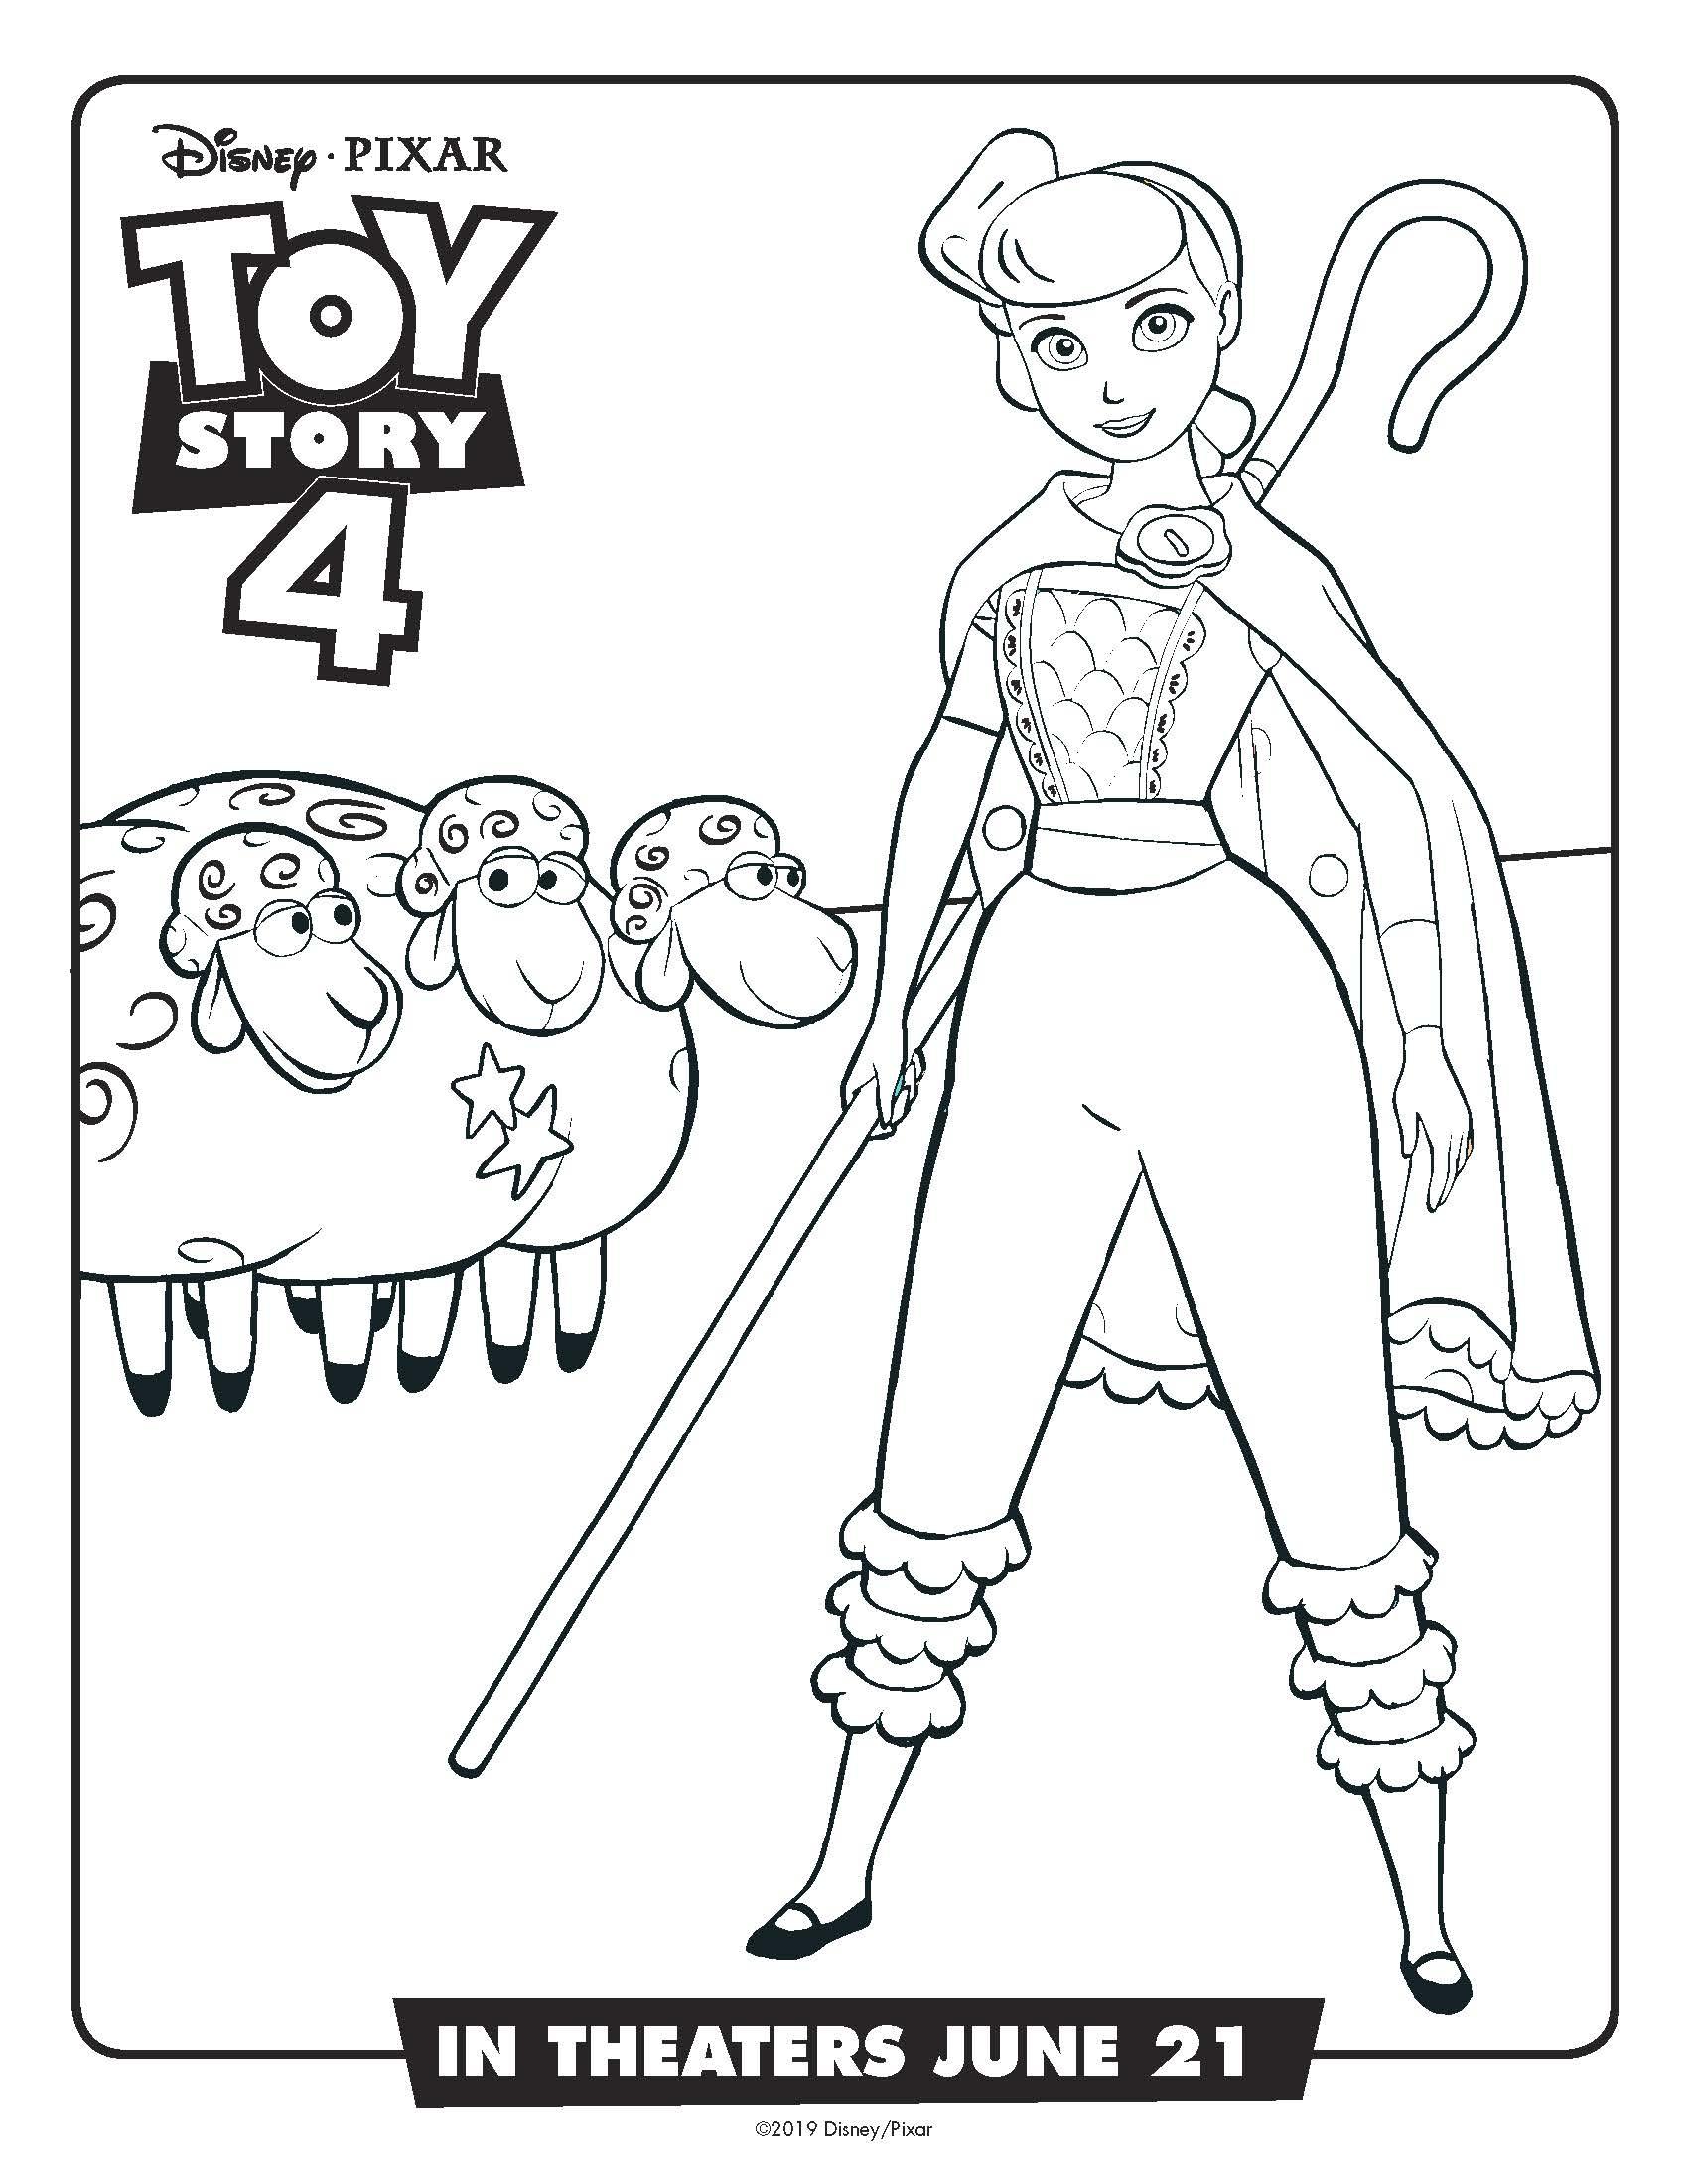 Free Printable Disney Toy Story Bo Peep Coloring Page #disney #toystory #toystory4 #bopeep #freeprintable #coloringpage